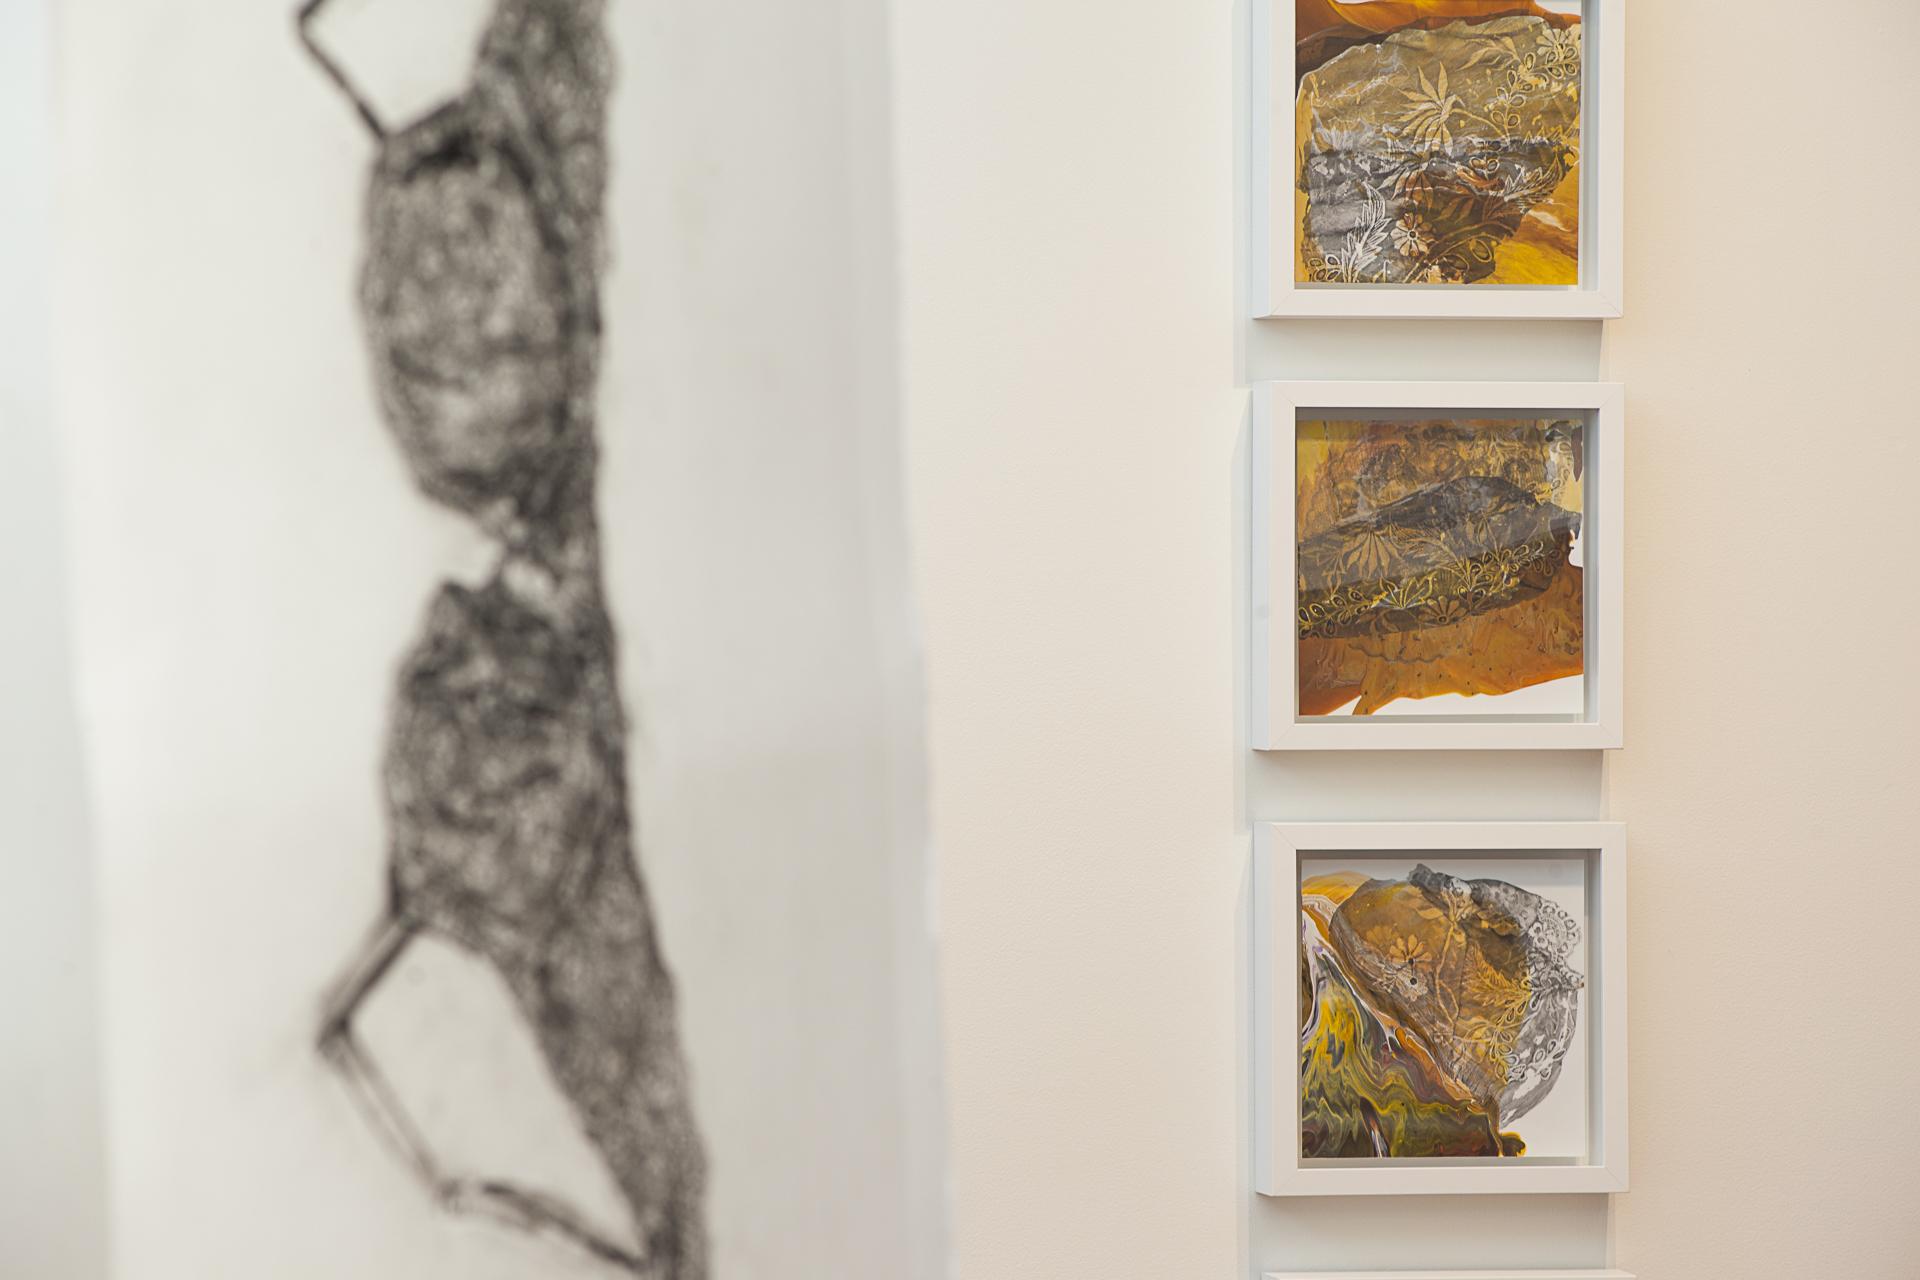 Left: Irene Carvajal, Right: Rea Lynn de Guzman, Fabric Fragments  Detail, 2016